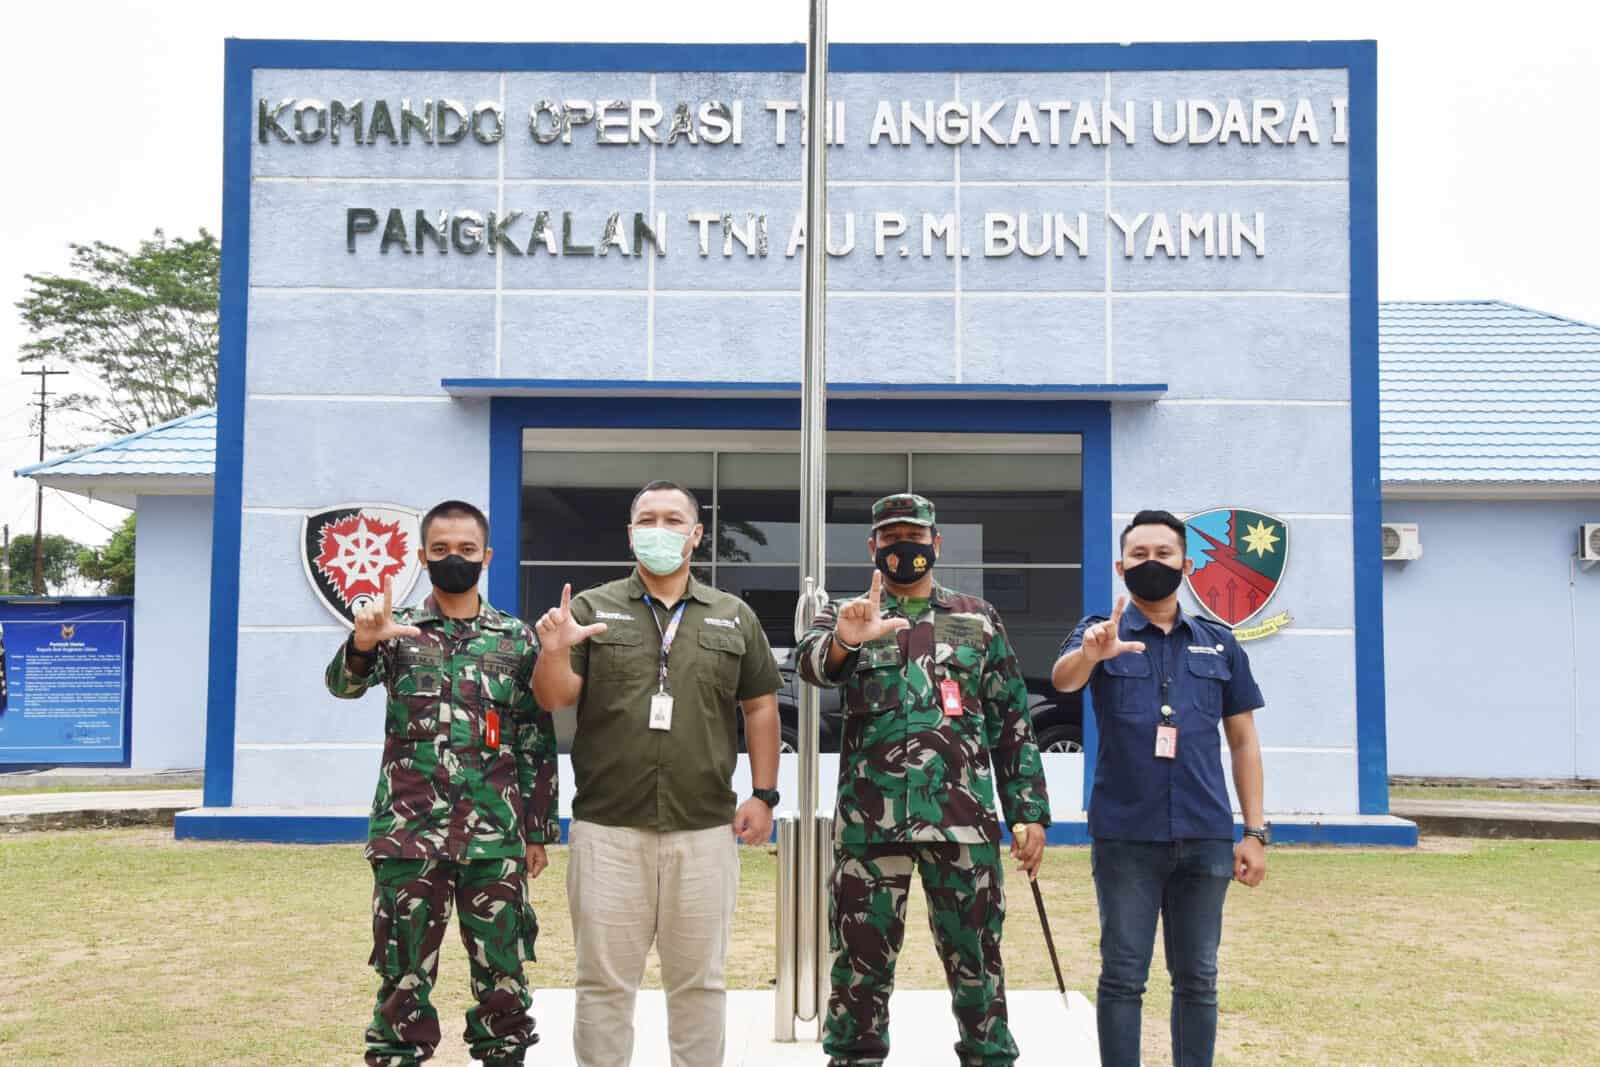 Danlanud Pangeran M. Bun Yamin Terima Kunjungan Kepala Bandara Radin Inten II Lampung